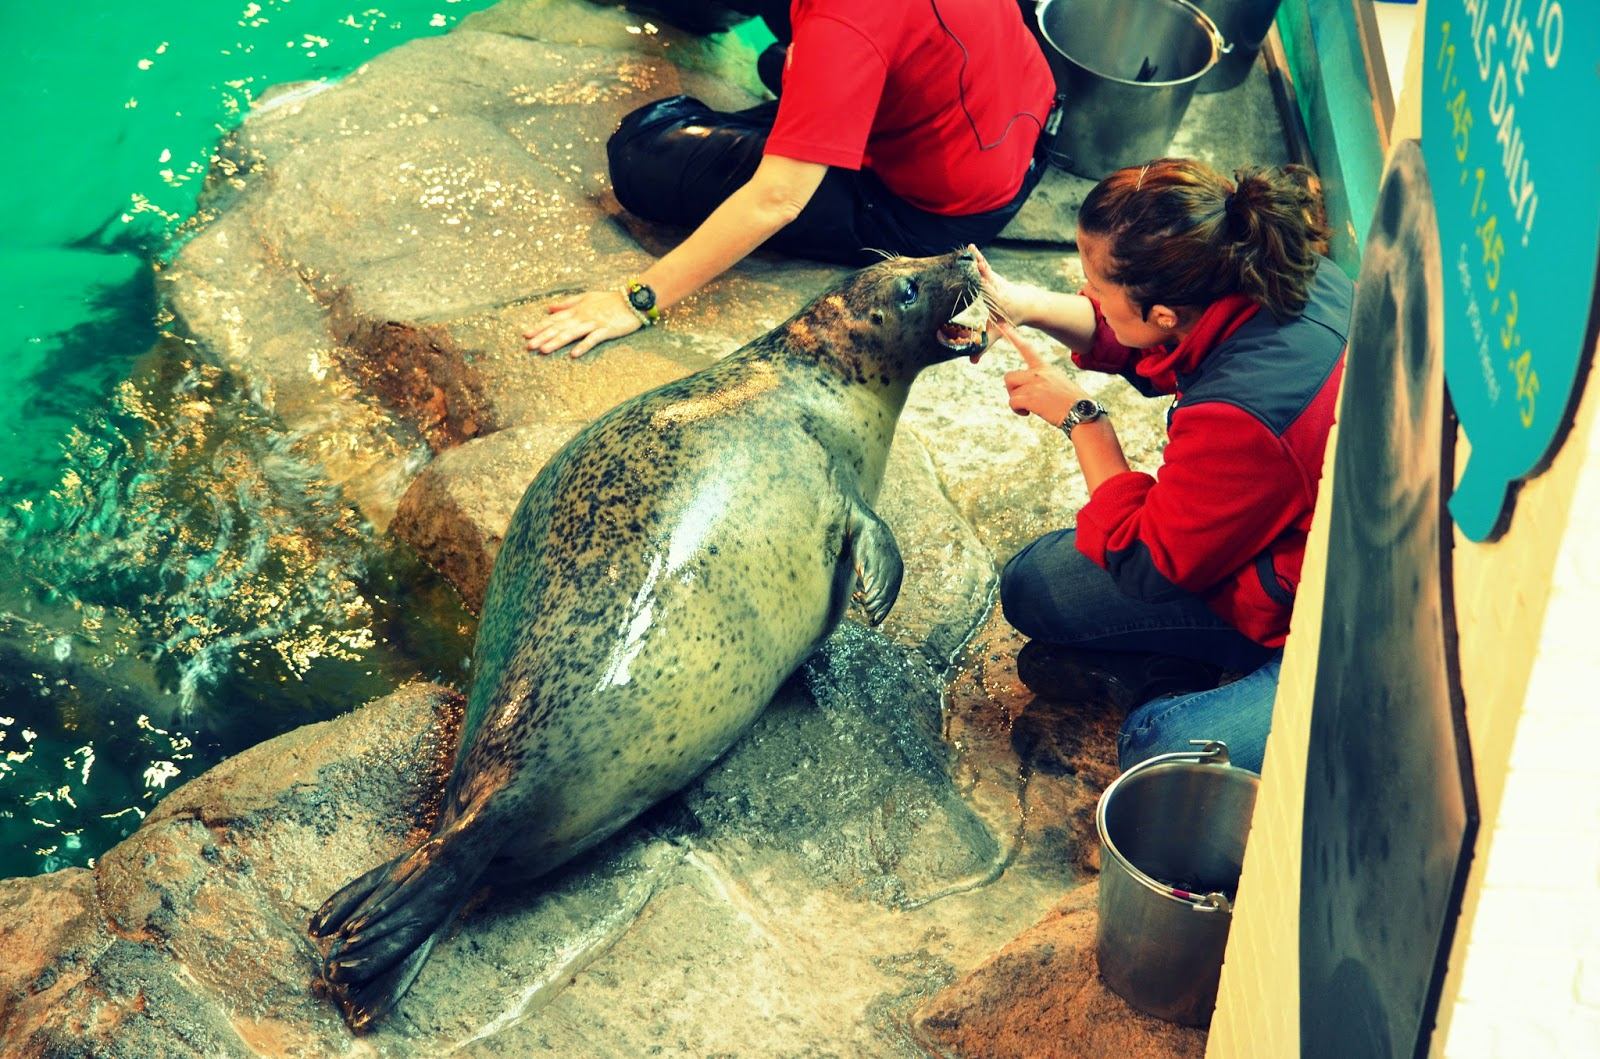 Maritime Aquarium Day Out